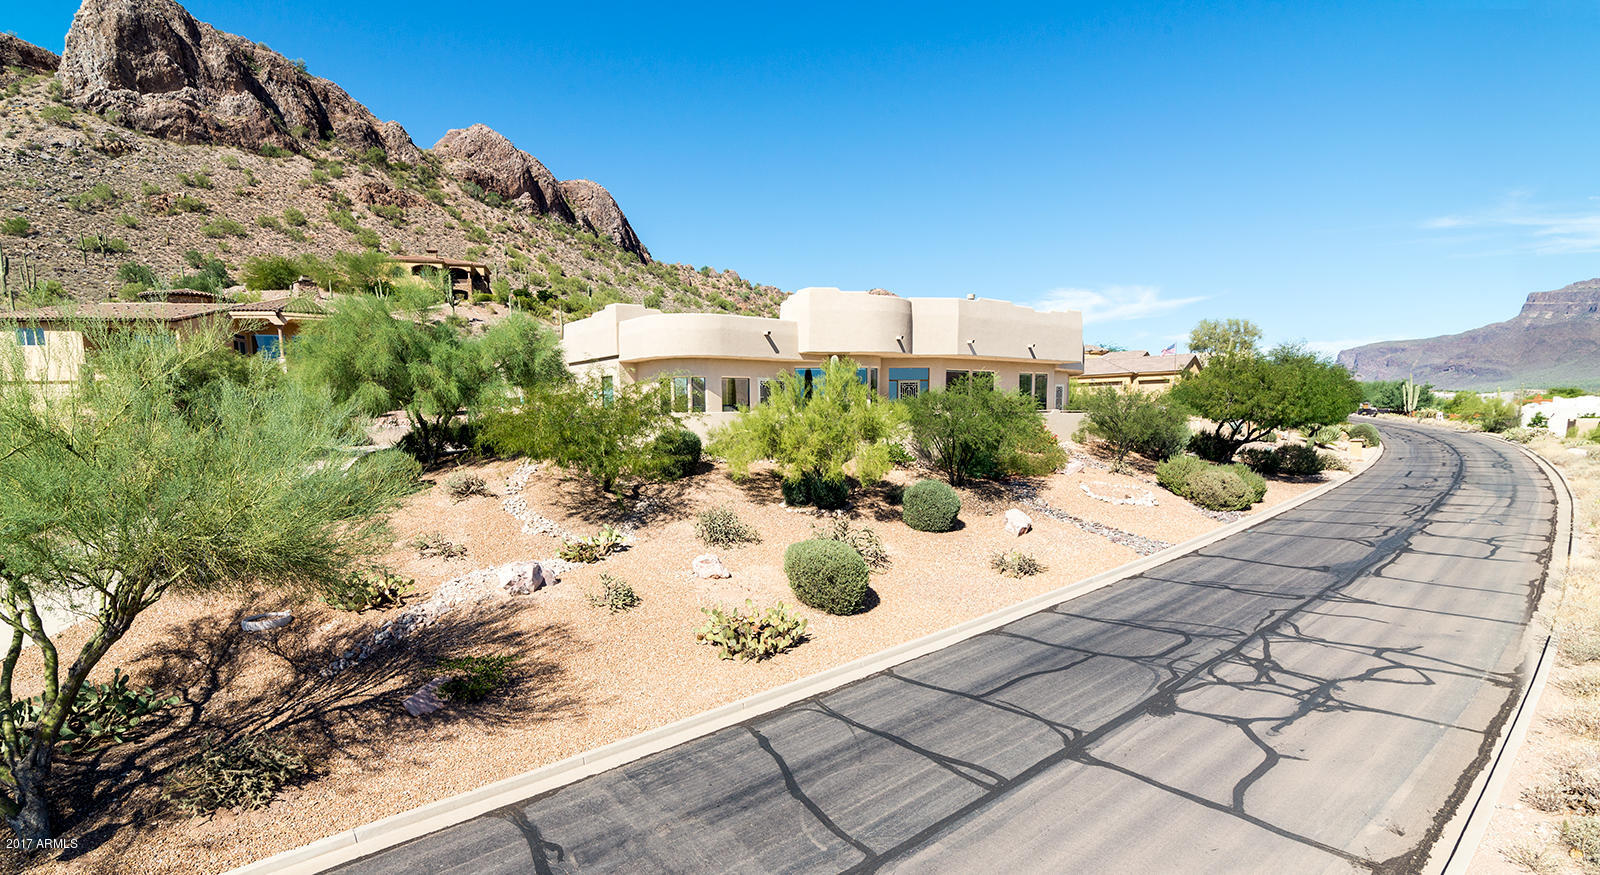 MLS 5675779 9860 E DEAD SURE Place, Gold Canyon, AZ 85118 Gold Canyon AZ Gold Canyon Ranch